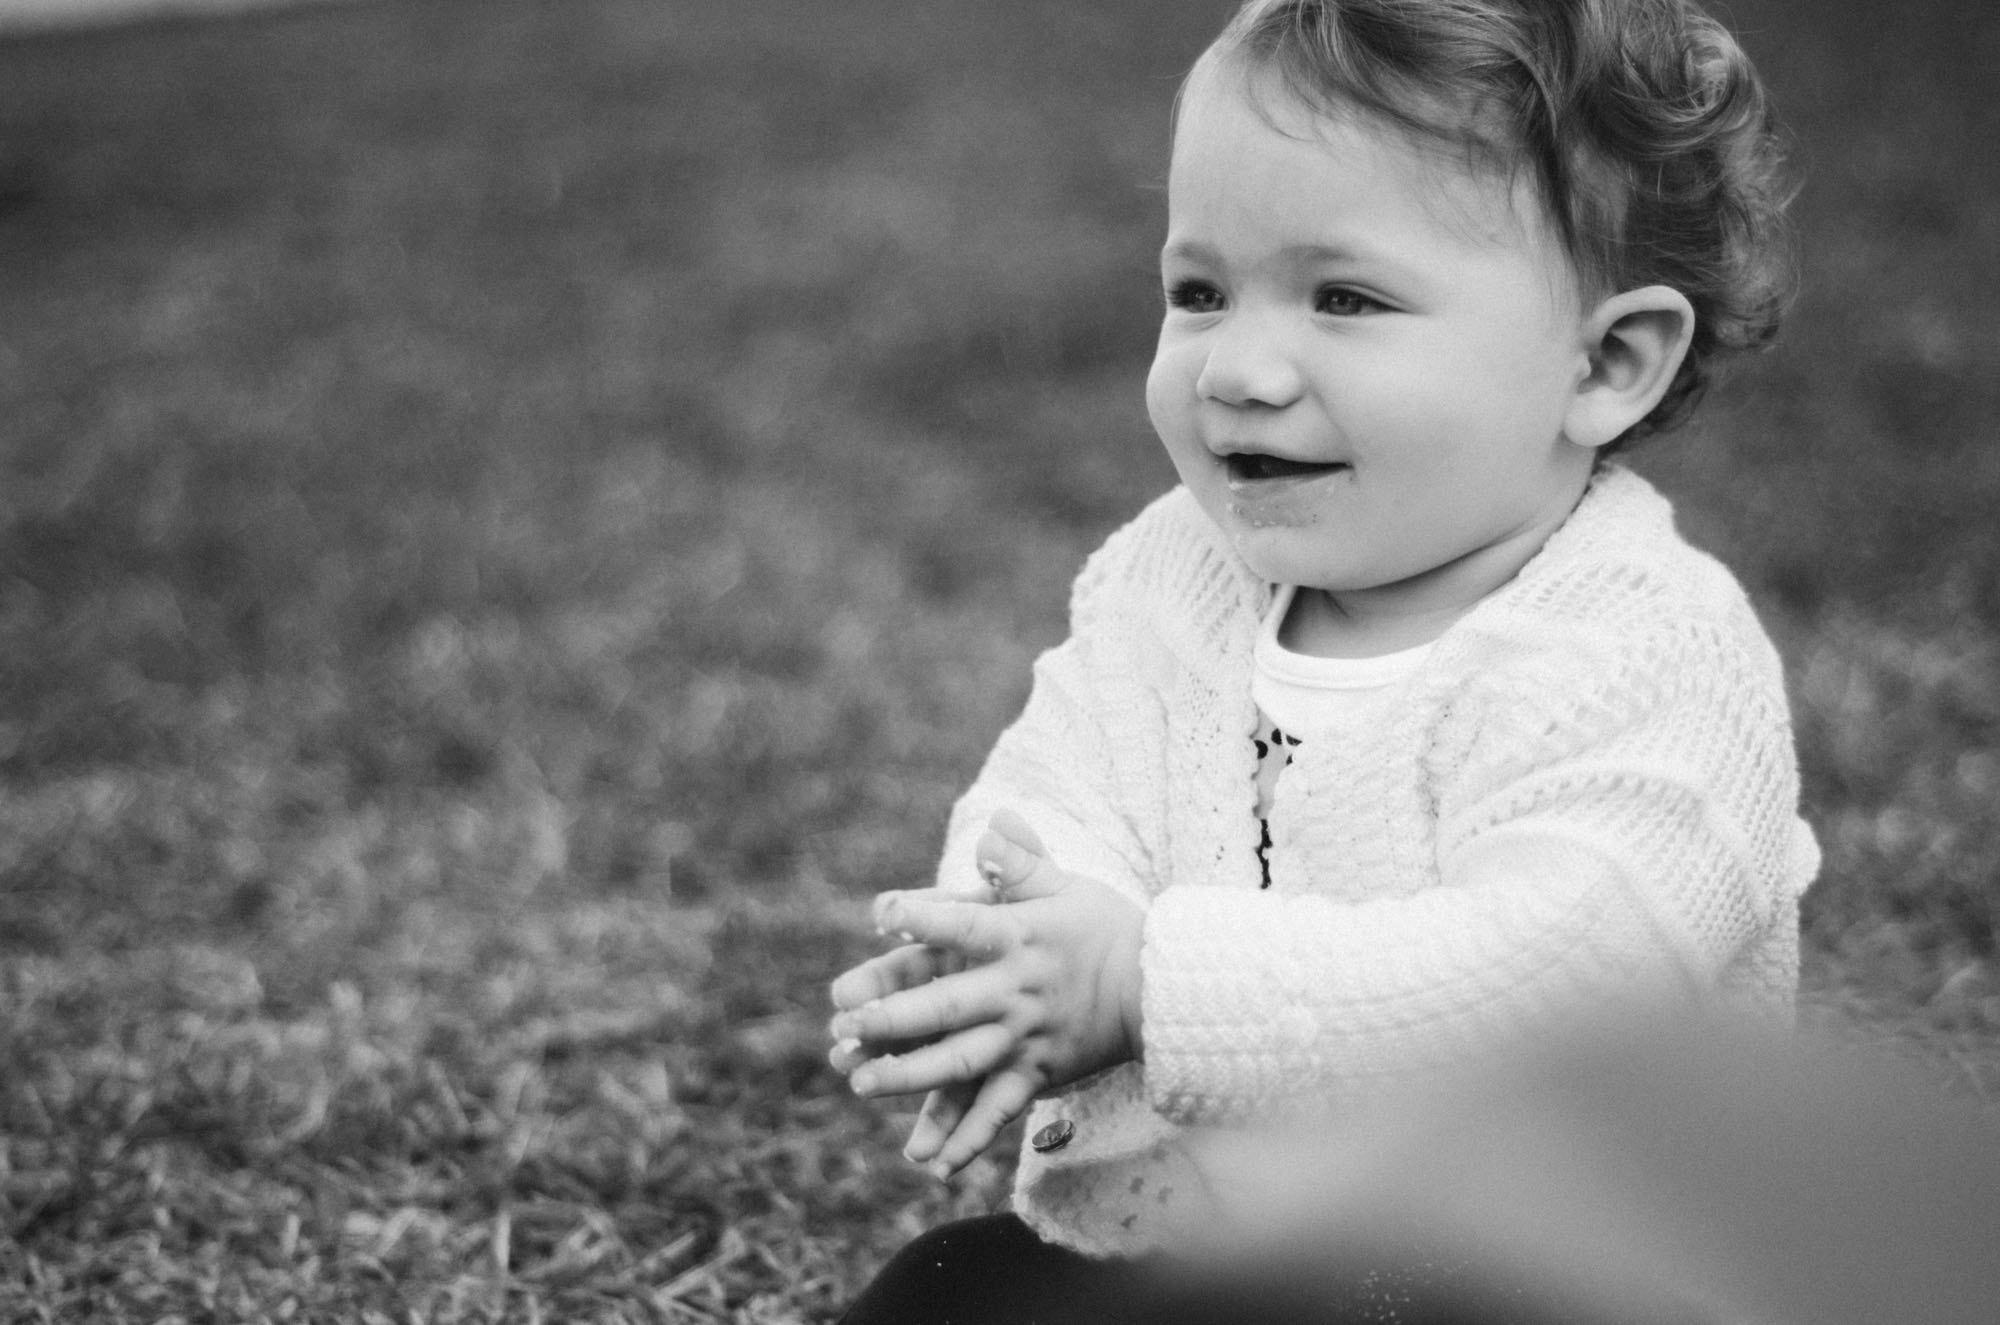 Maria-Eva-ensaio-infantil-ubatuba-sp-30-06-16-115